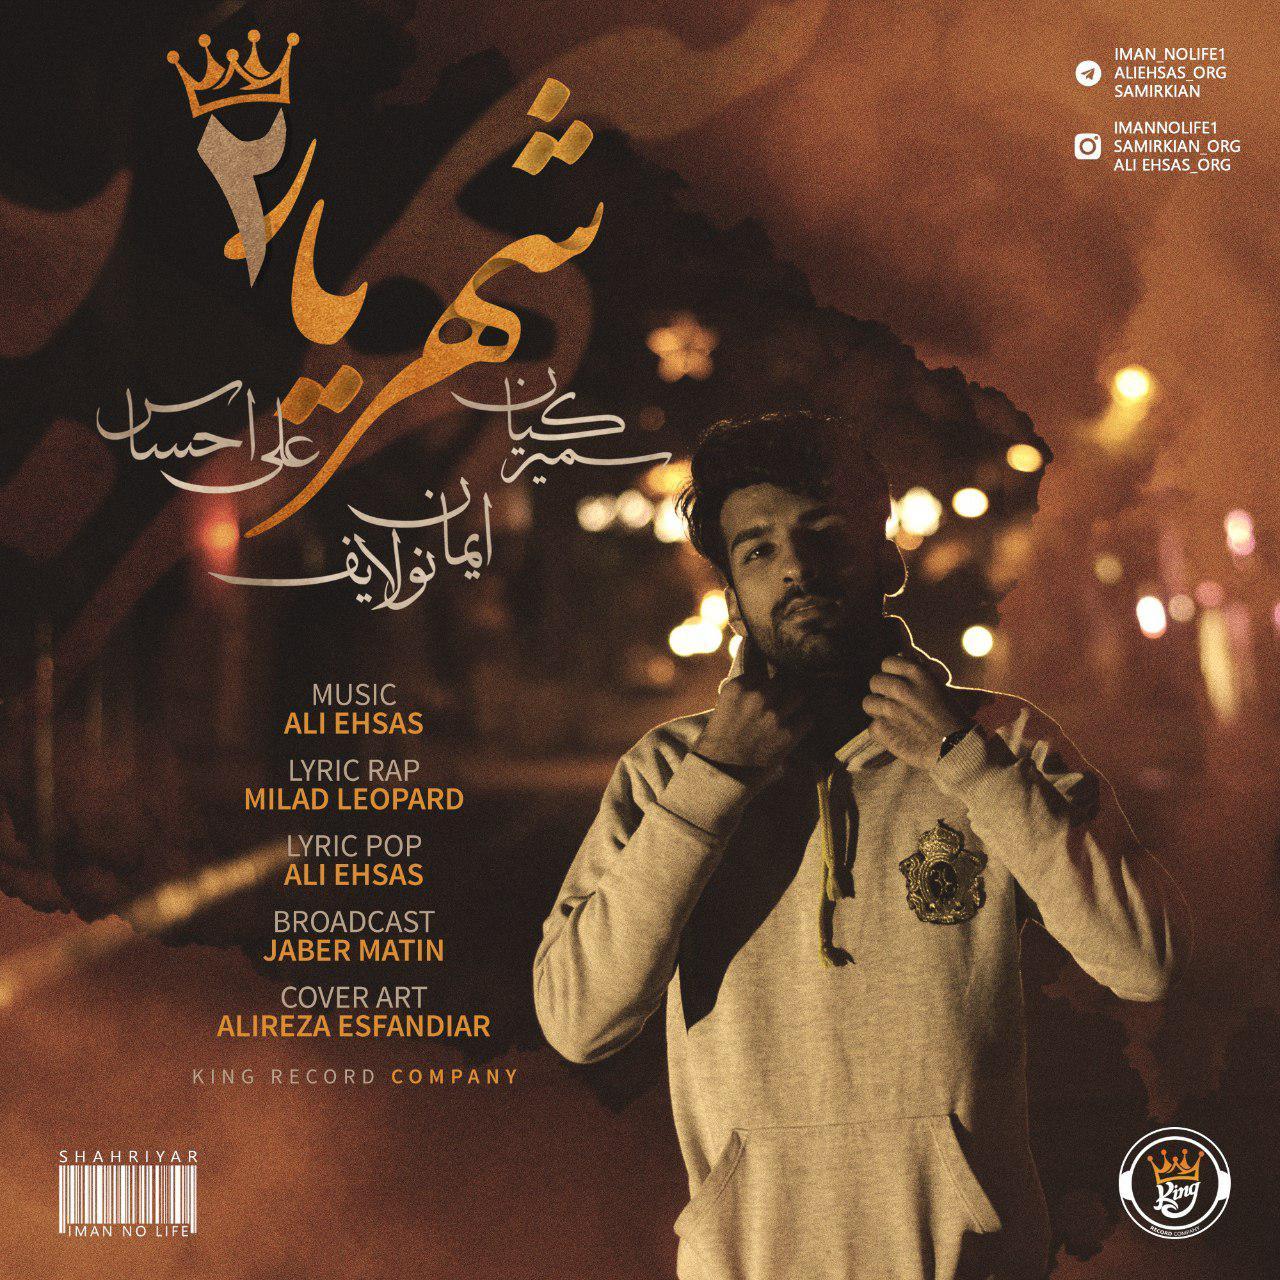 Iman NoLife – Shahryar 2 (Ft Ali Ehsas And SamirKian)